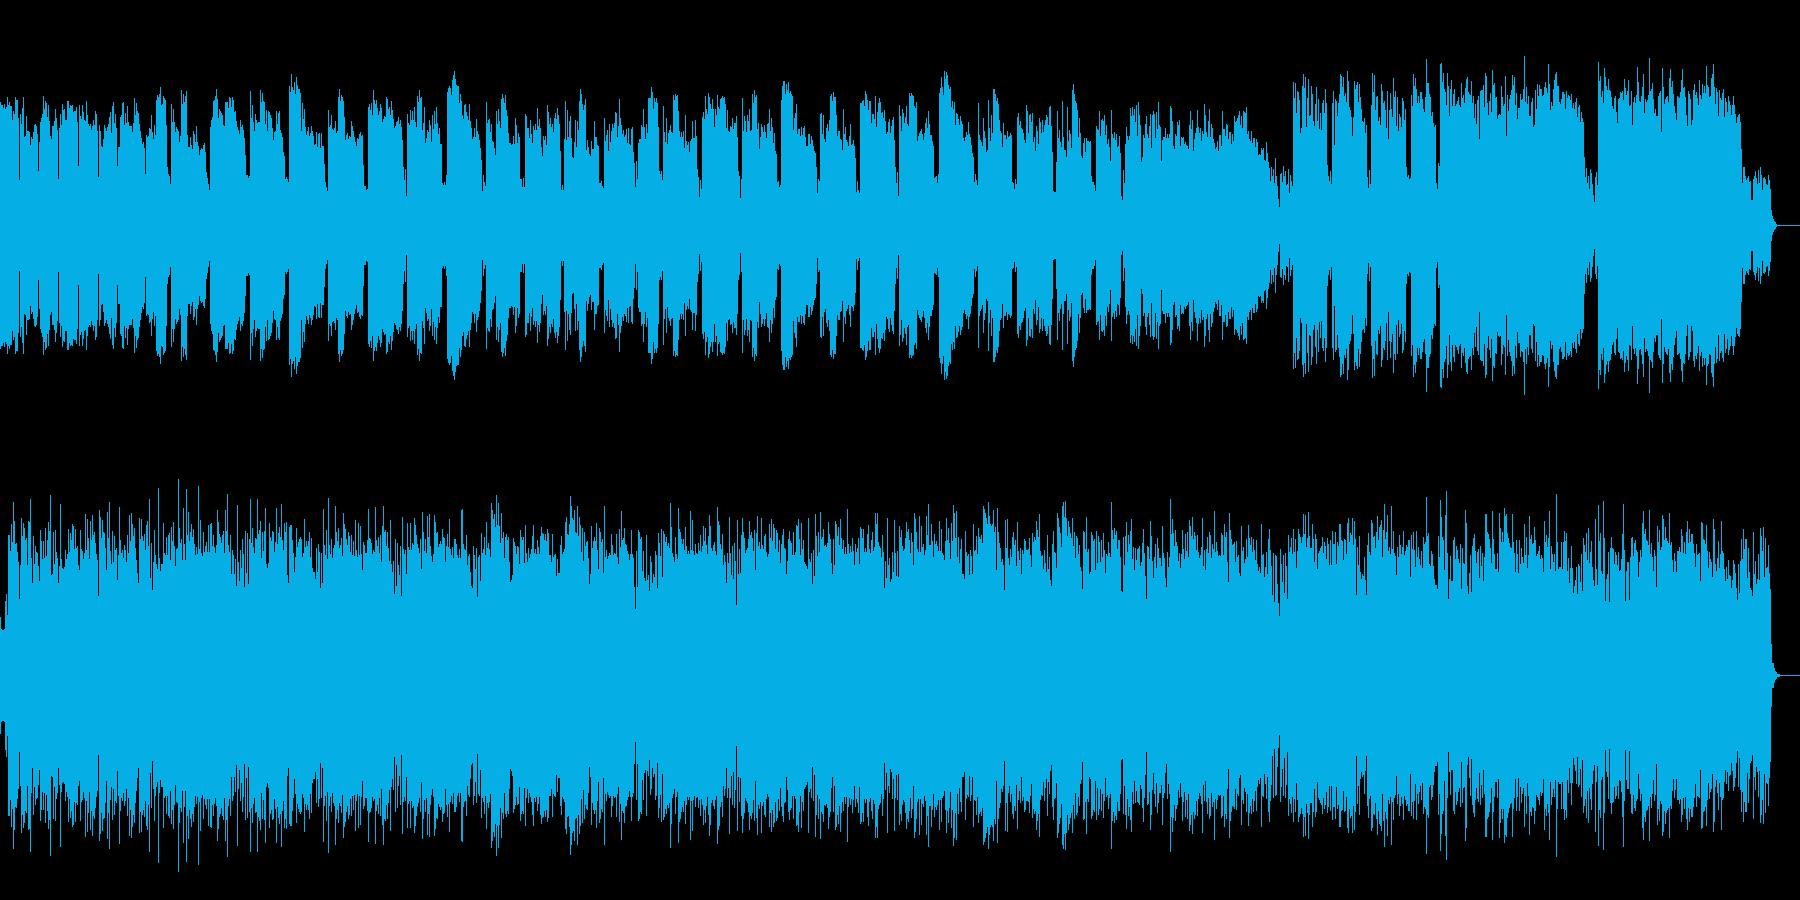 SAXとギターの優しいメロディアスな楽曲の再生済みの波形